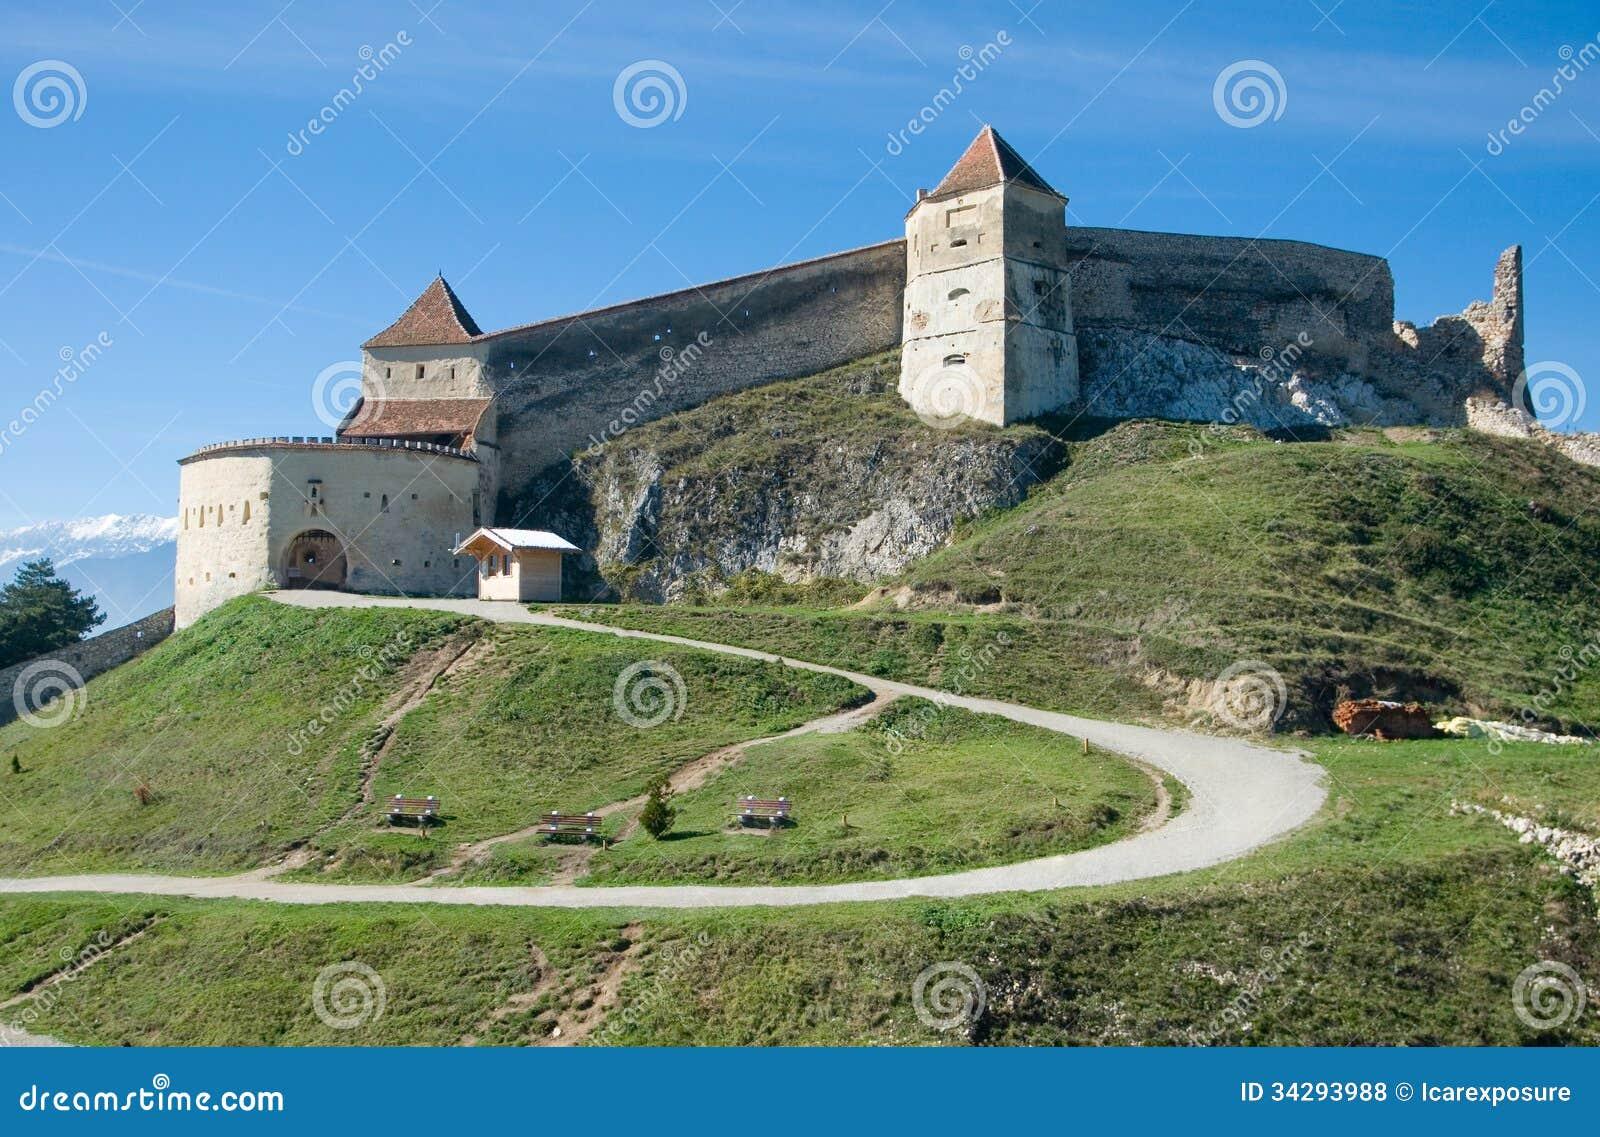 Mittelalterliche Festung in Rasnov